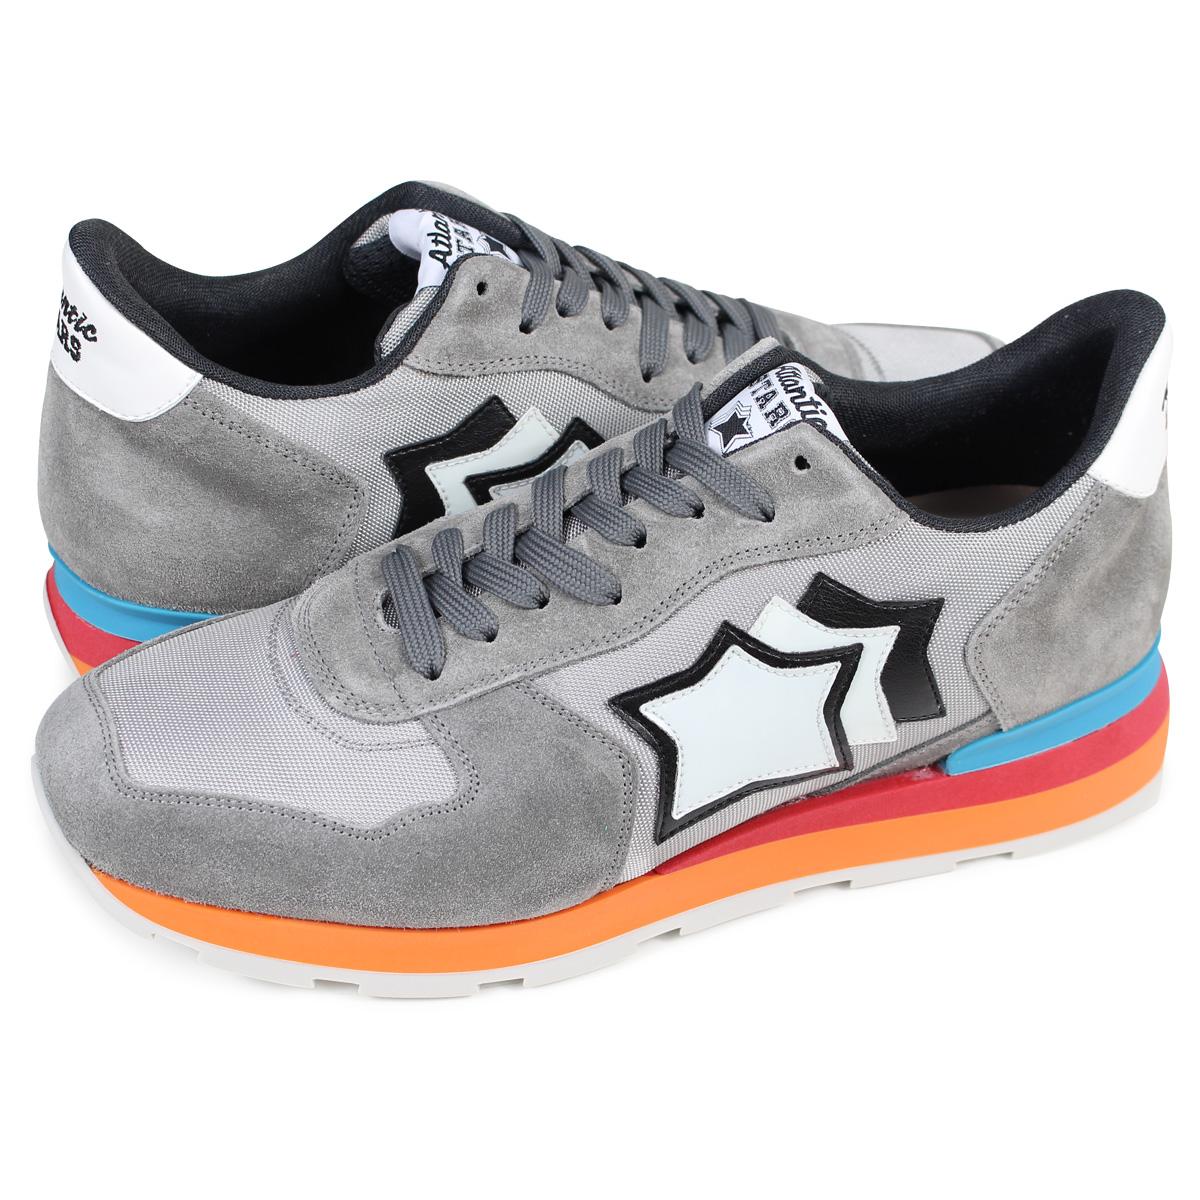 US, Fog//Charcoal M Mens OluKai Nohea Moku Shoes 46 M EU // 13 D